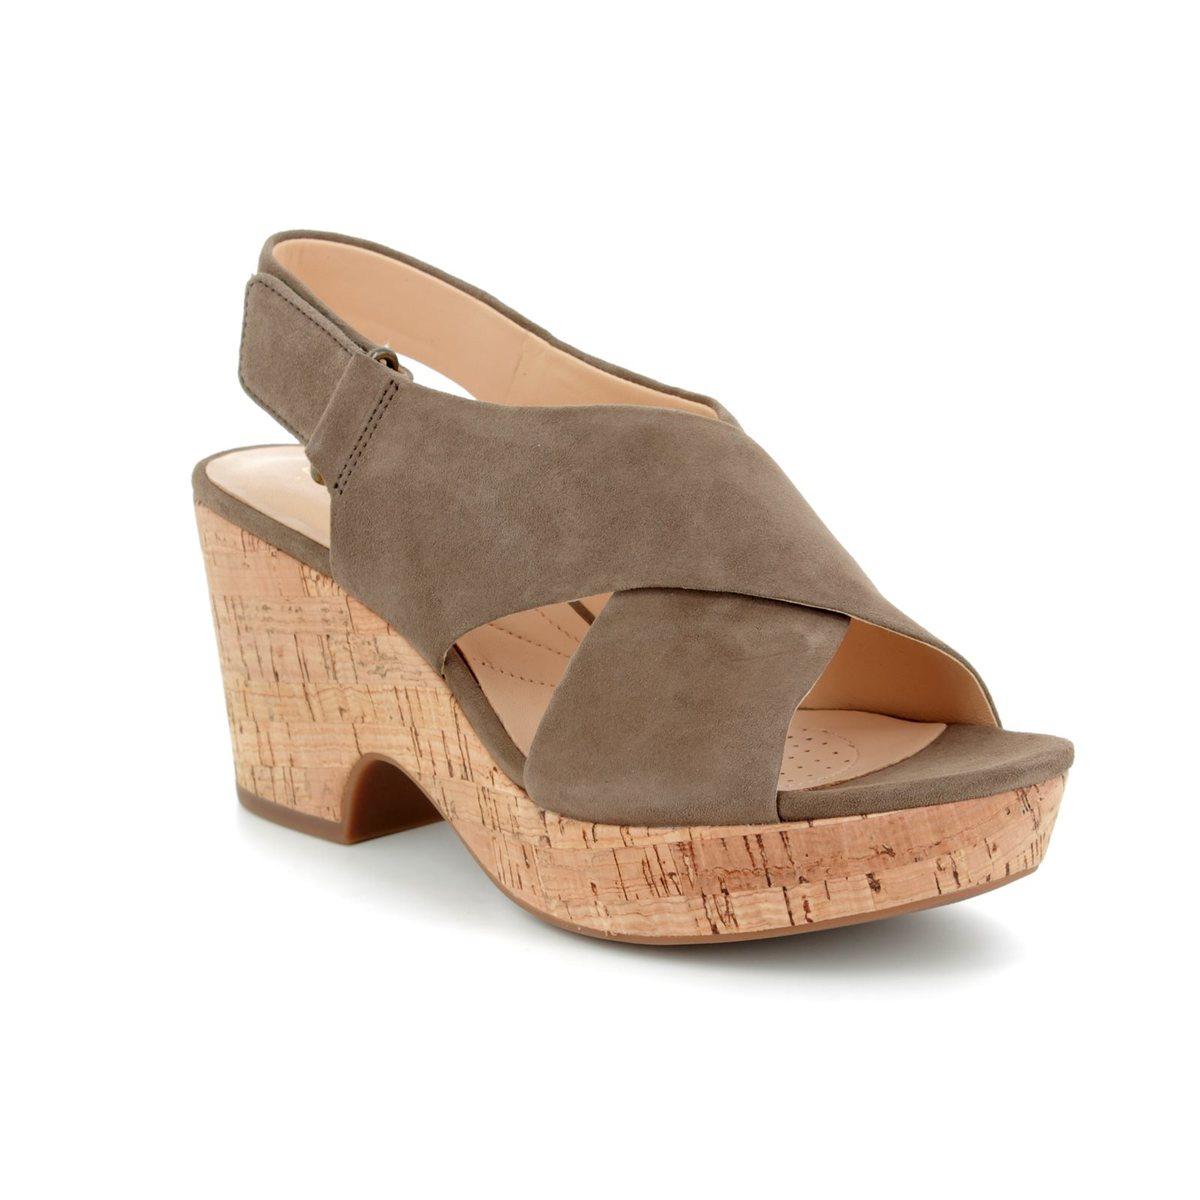 960cd486113c Clarks Heeled Sandals - Olive - 3381 74D MARITSA LARA